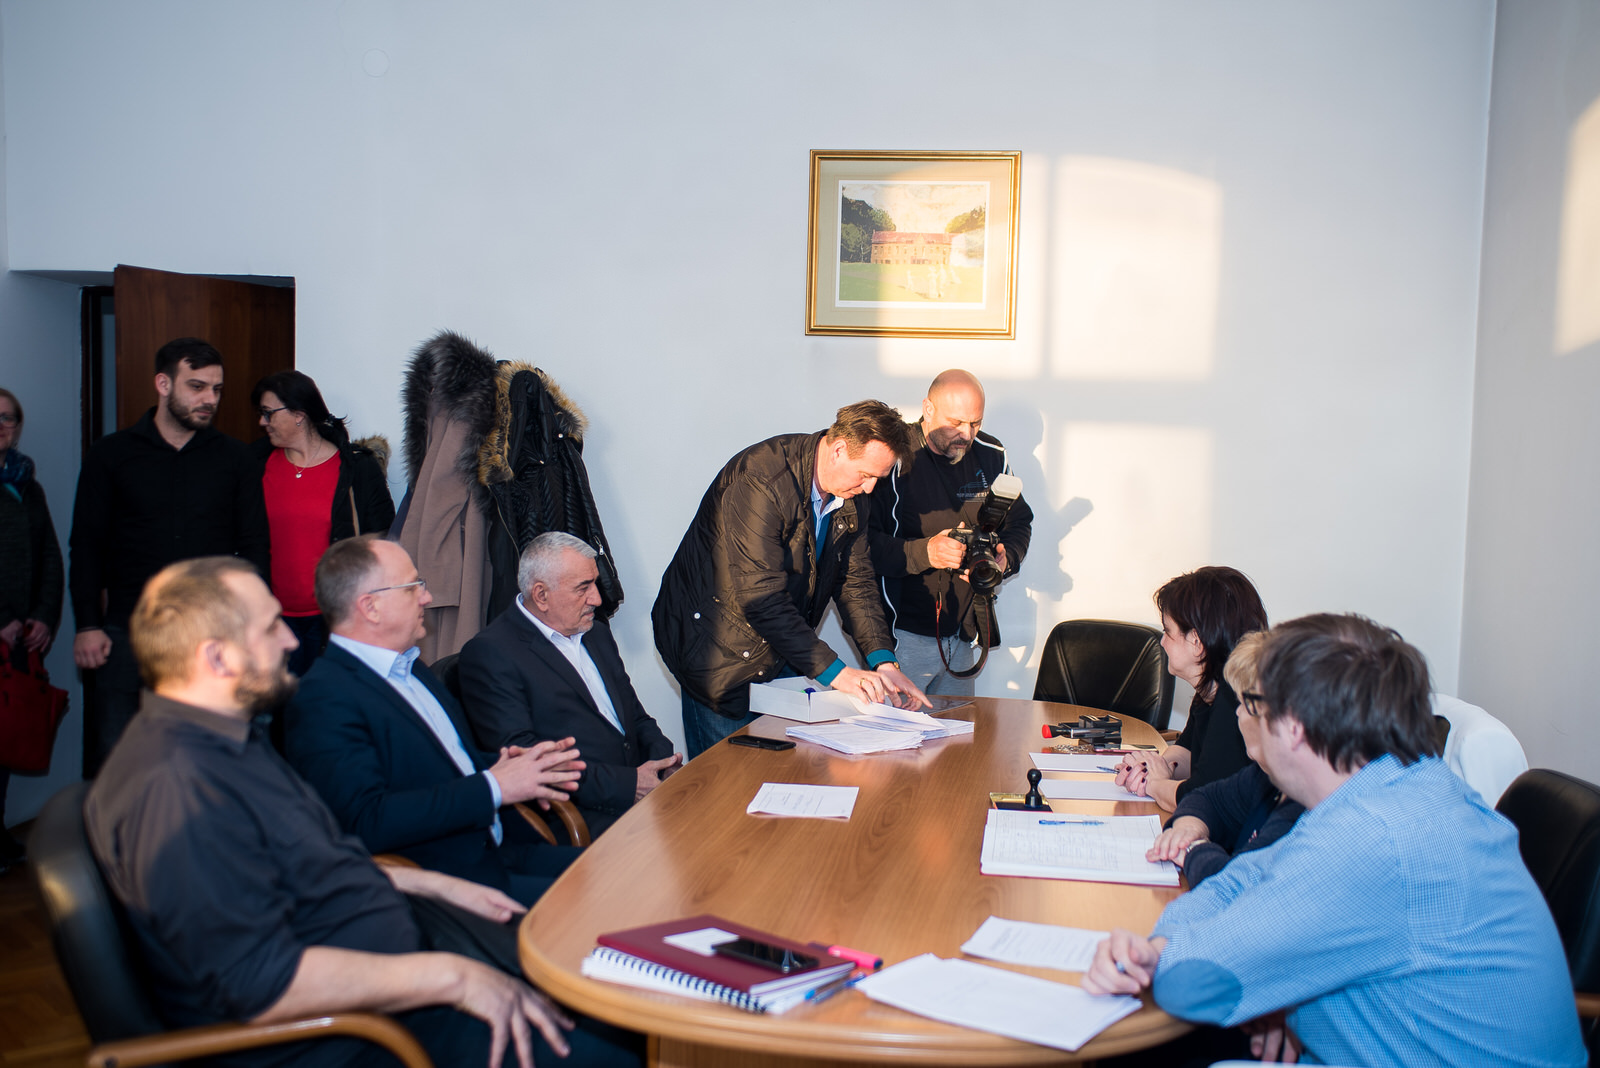 likaclub_politika-gospić_2019_bura-promjena-9